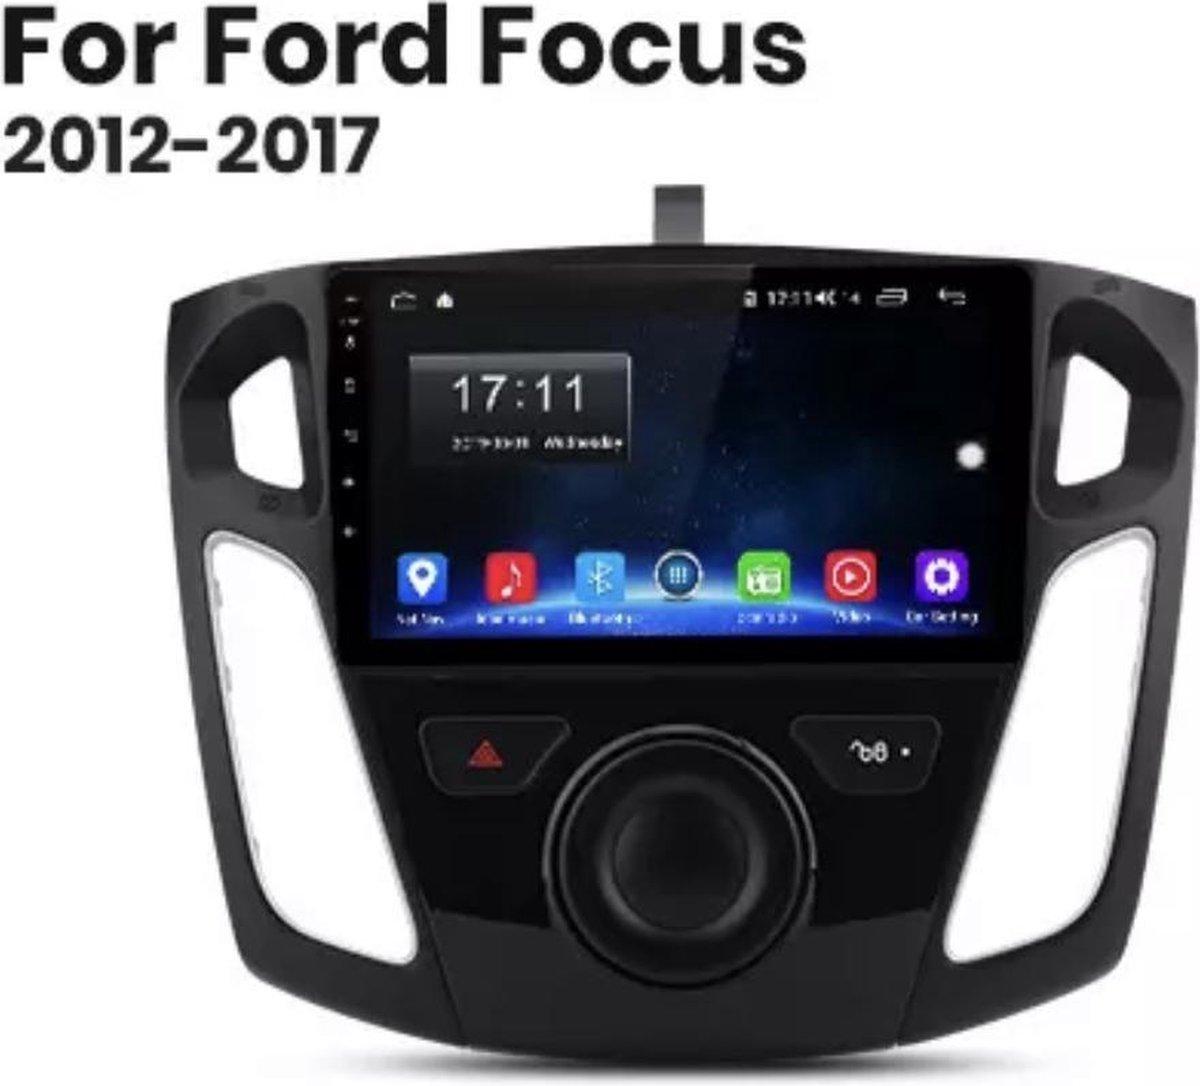 GRATIS CAMERA!  Ford Focus 2012-2017 Android 10 2+32GB navigatie en multimediasysteem